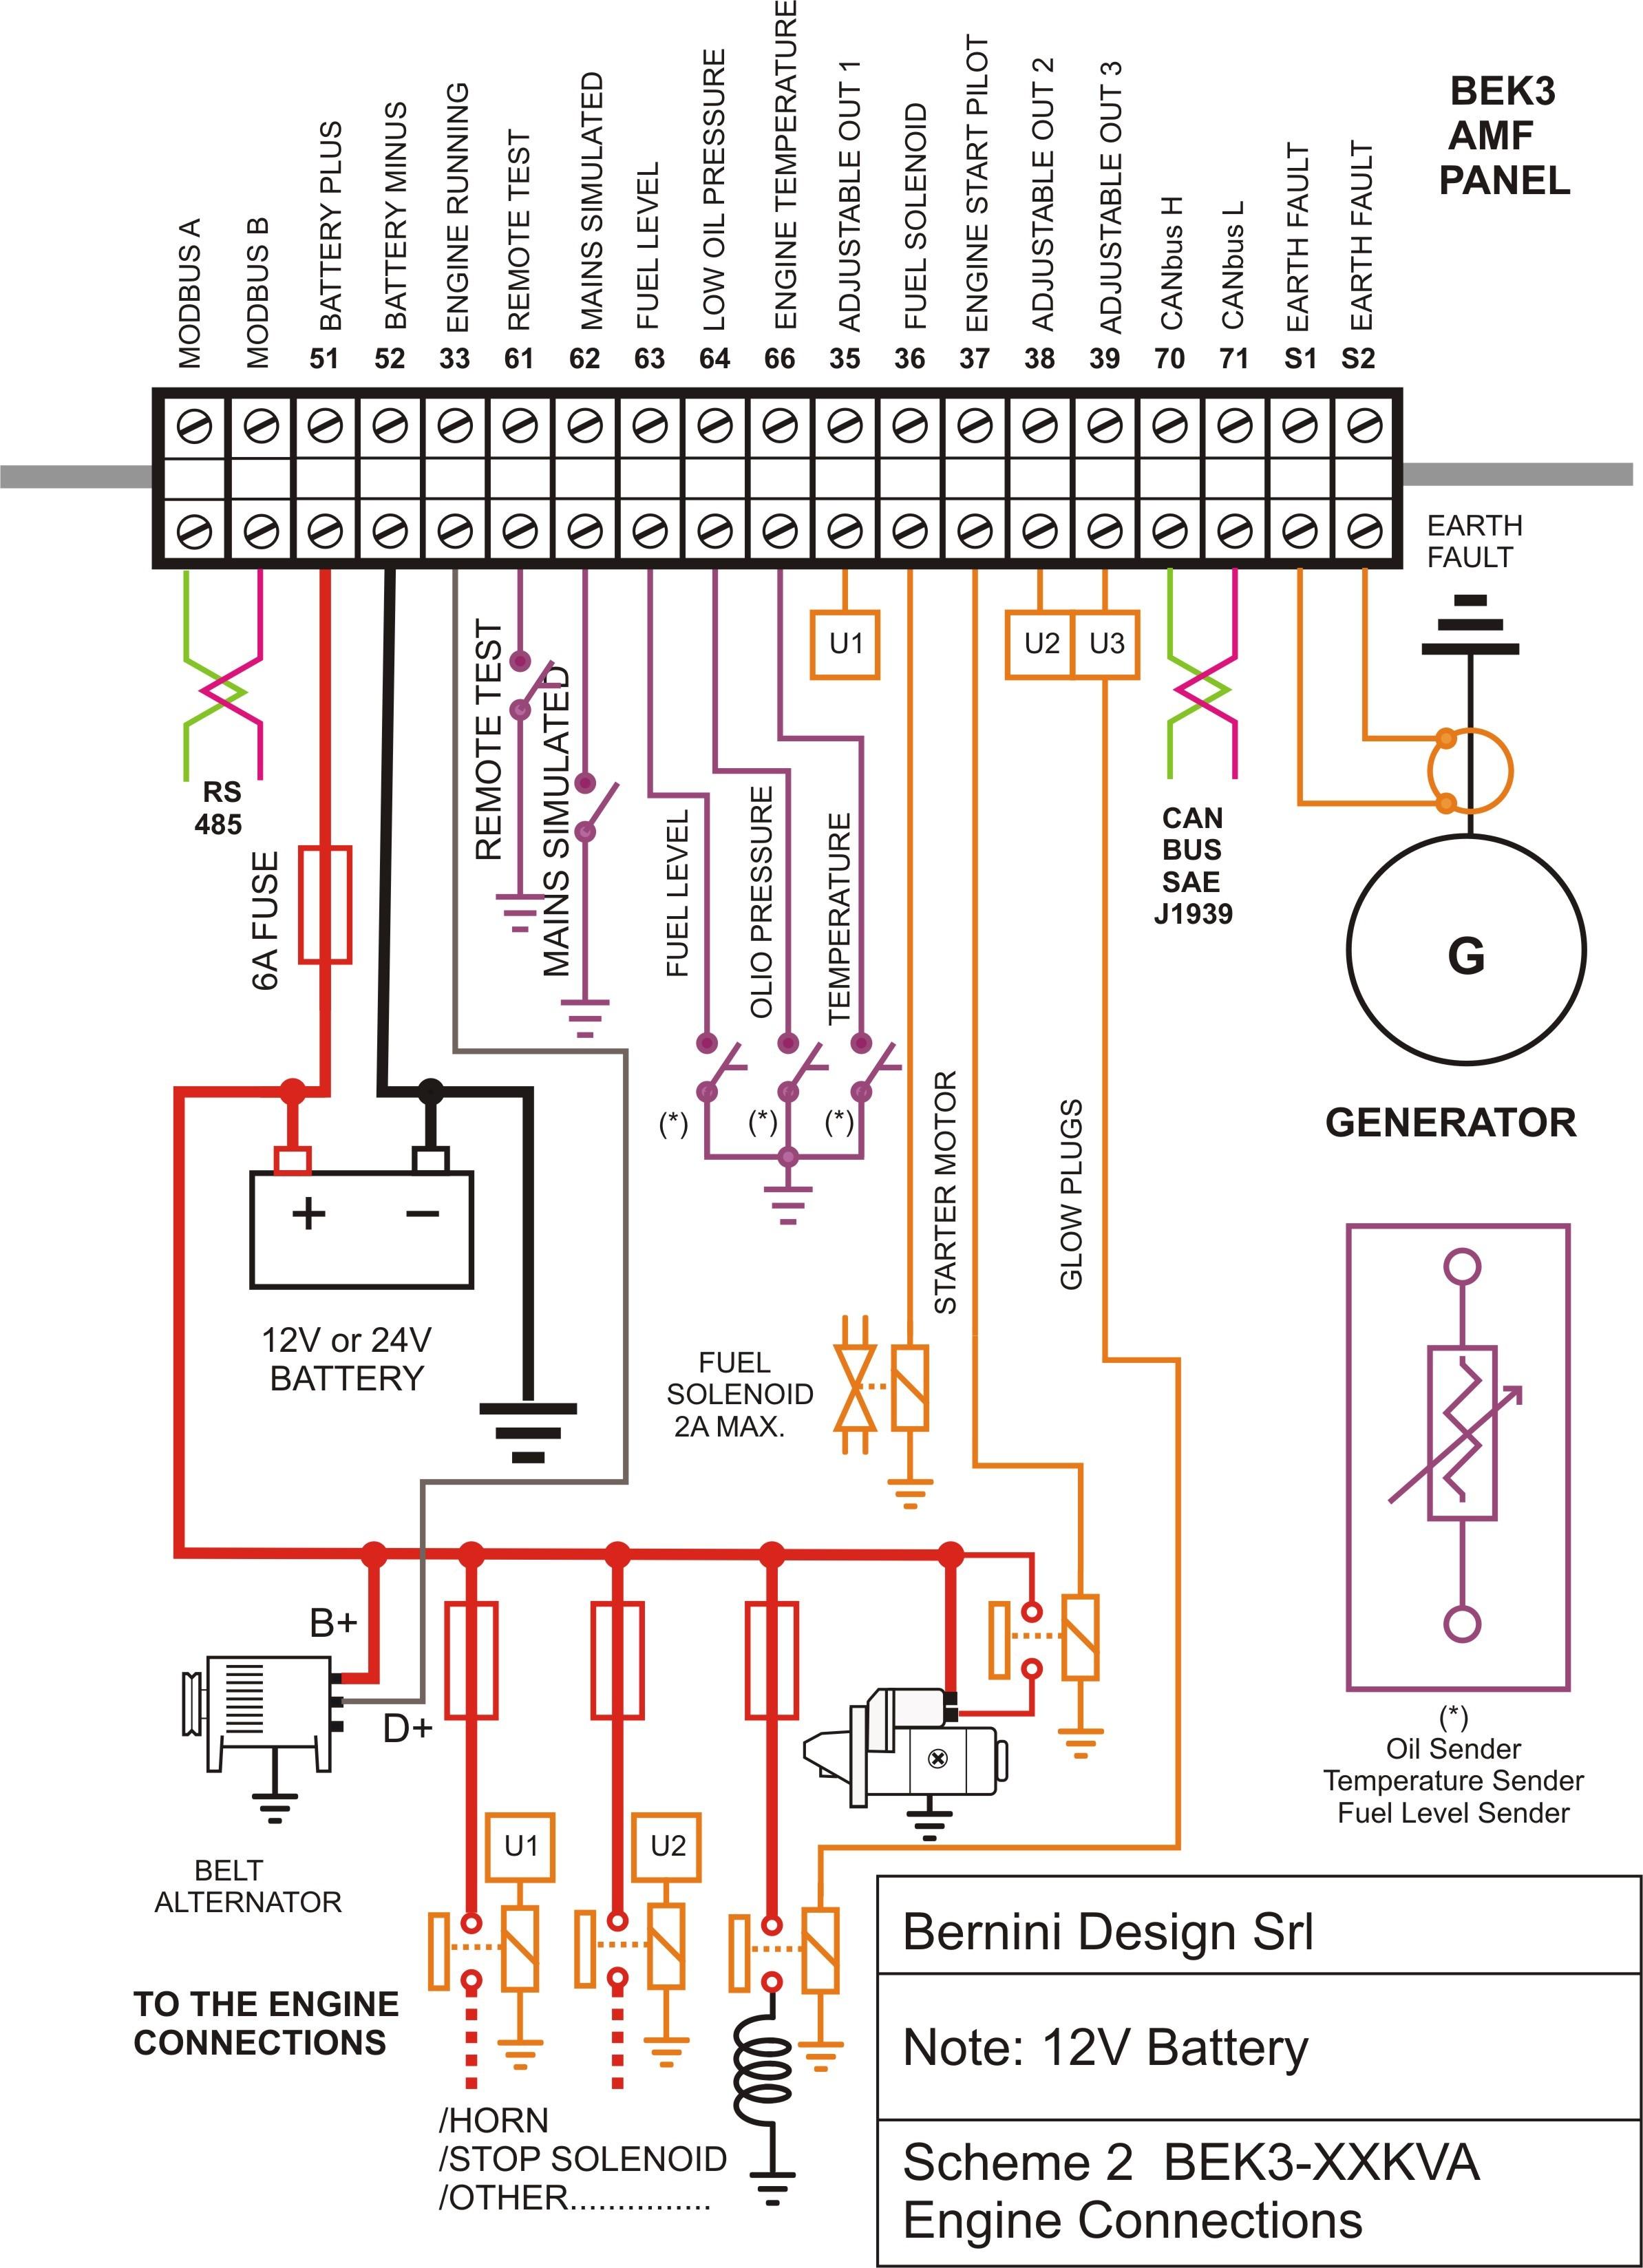 Motor control panel wiring diagram wiring diagram single phase motor motor control panel wiring diagram electric motor drawing at getdrawings of motor control panel wiring diagram cheapraybanclubmaster Gallery